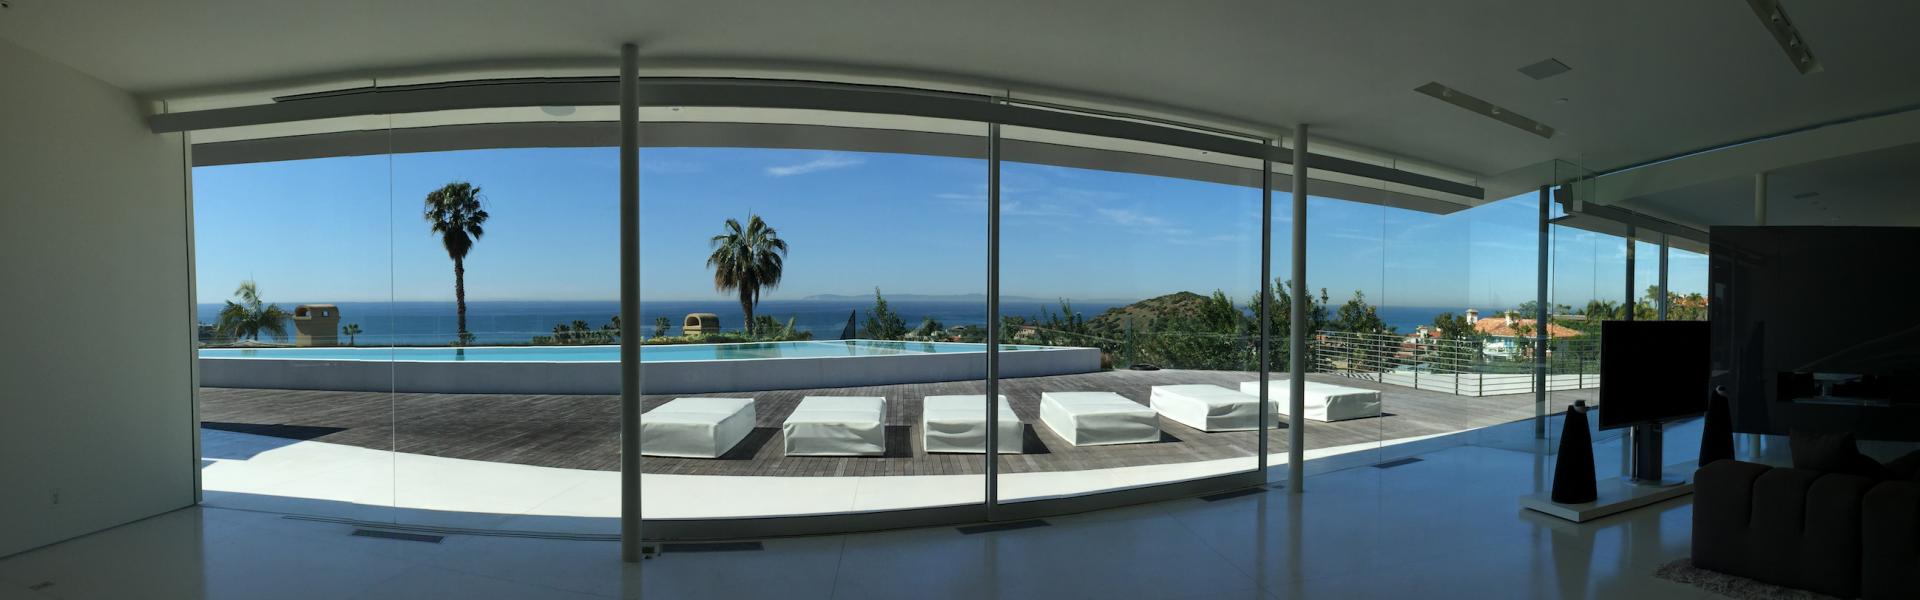 Smart home installation by NXT AV for Newport Beach